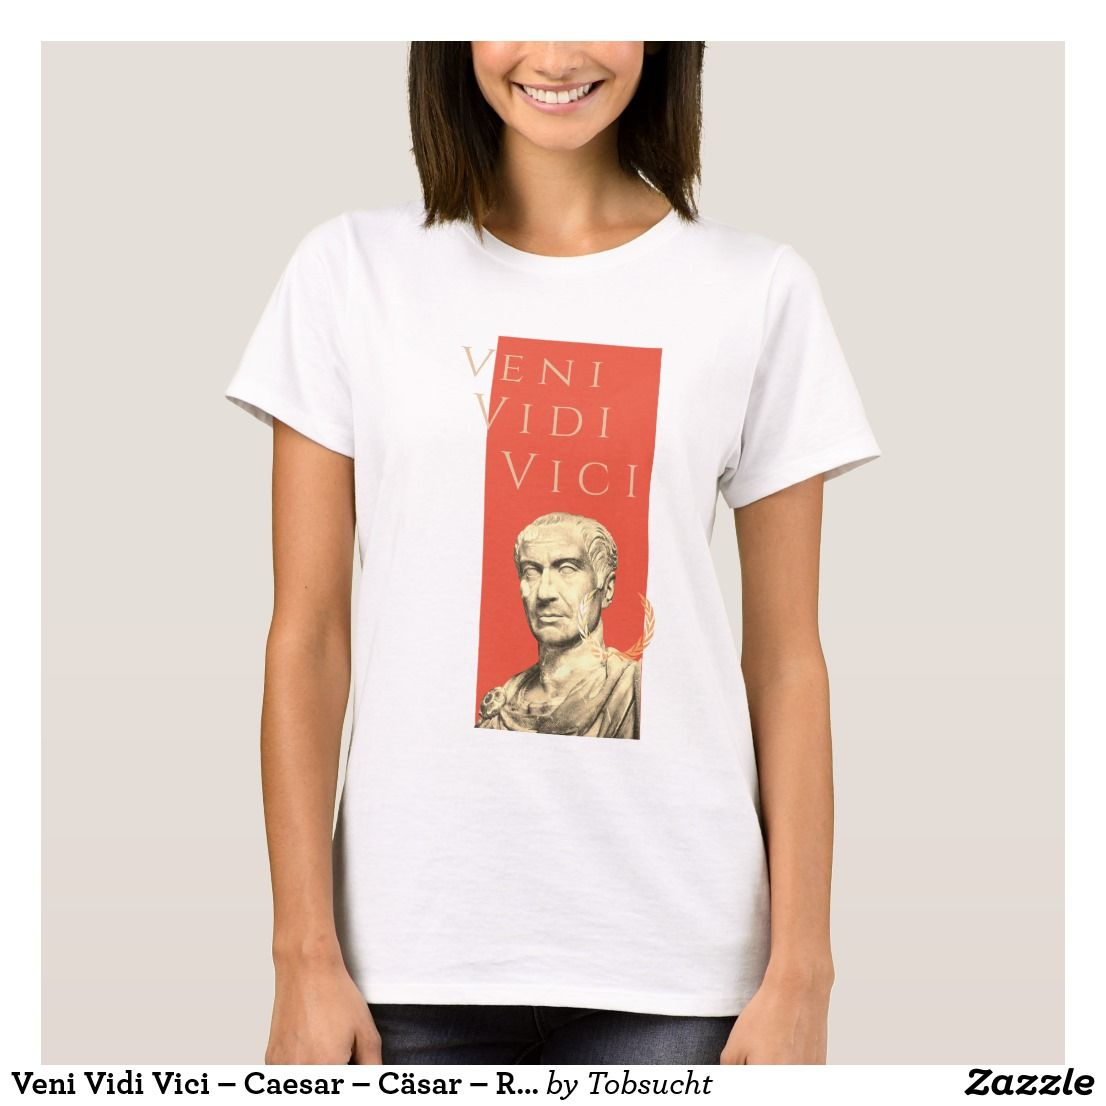 Veni Vidi Vici - Caesar - Cäsar - Roman antique T-Shirt ...